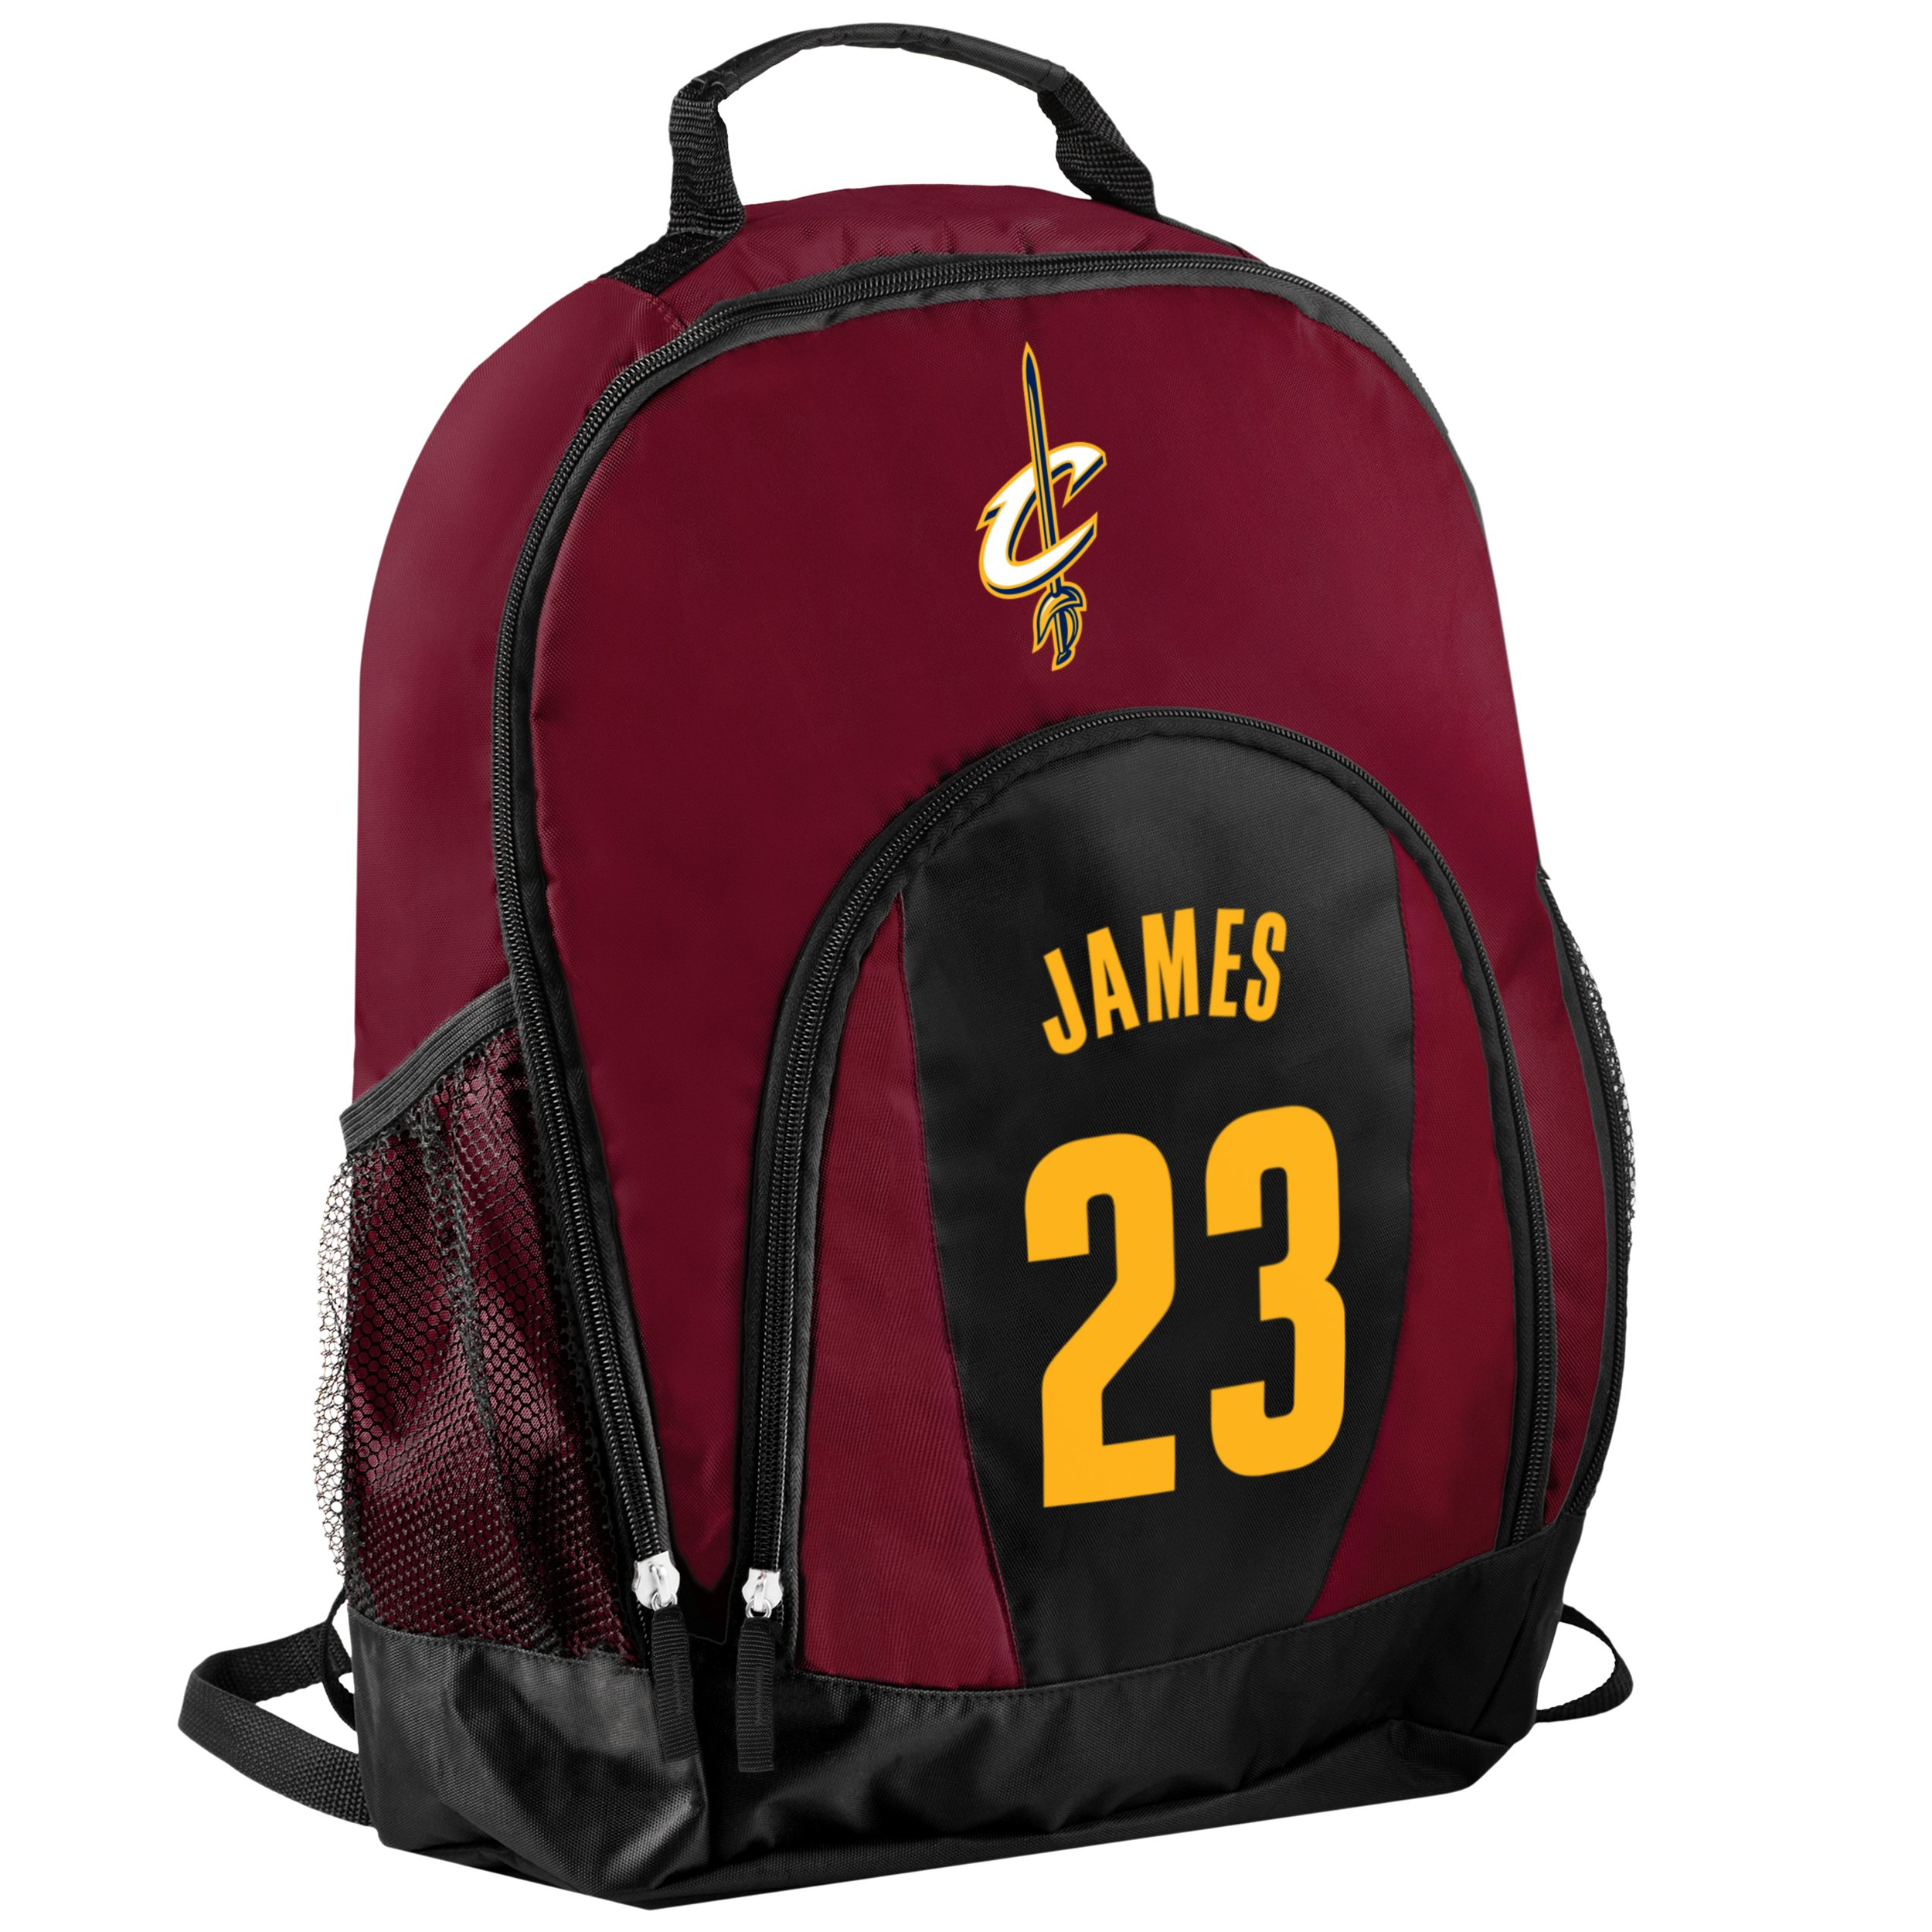 TBFC Cleveland Cavaliers Primetime Backpack School Gym Bag - Lebron James #23 by TBFC